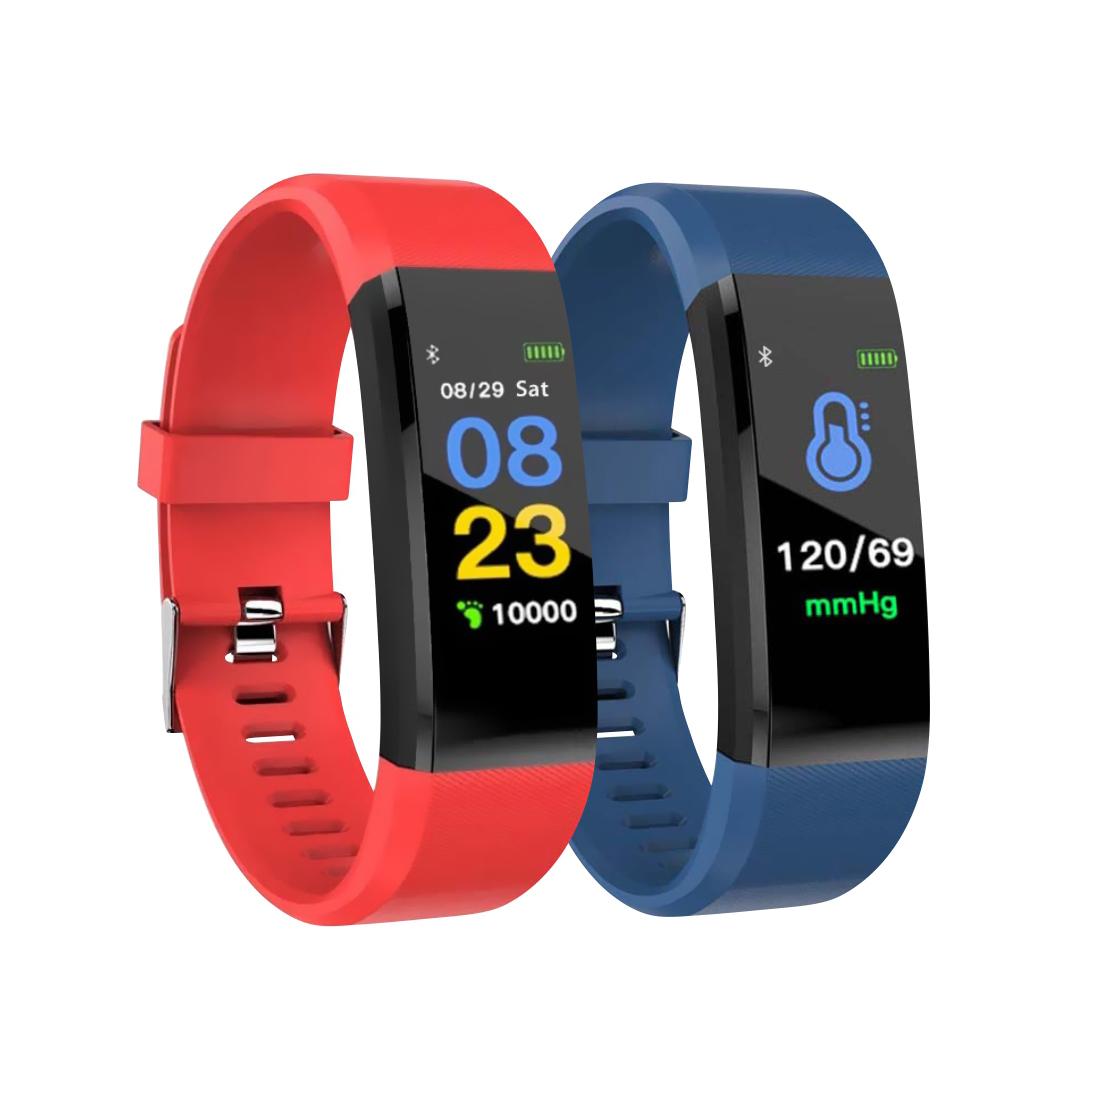 Pachet Promotional 2 Bratari fitness inteligente I15+ cu masurarea tensiunii arteriale si a ritmului cardiac, Rosie + Albastra imagine